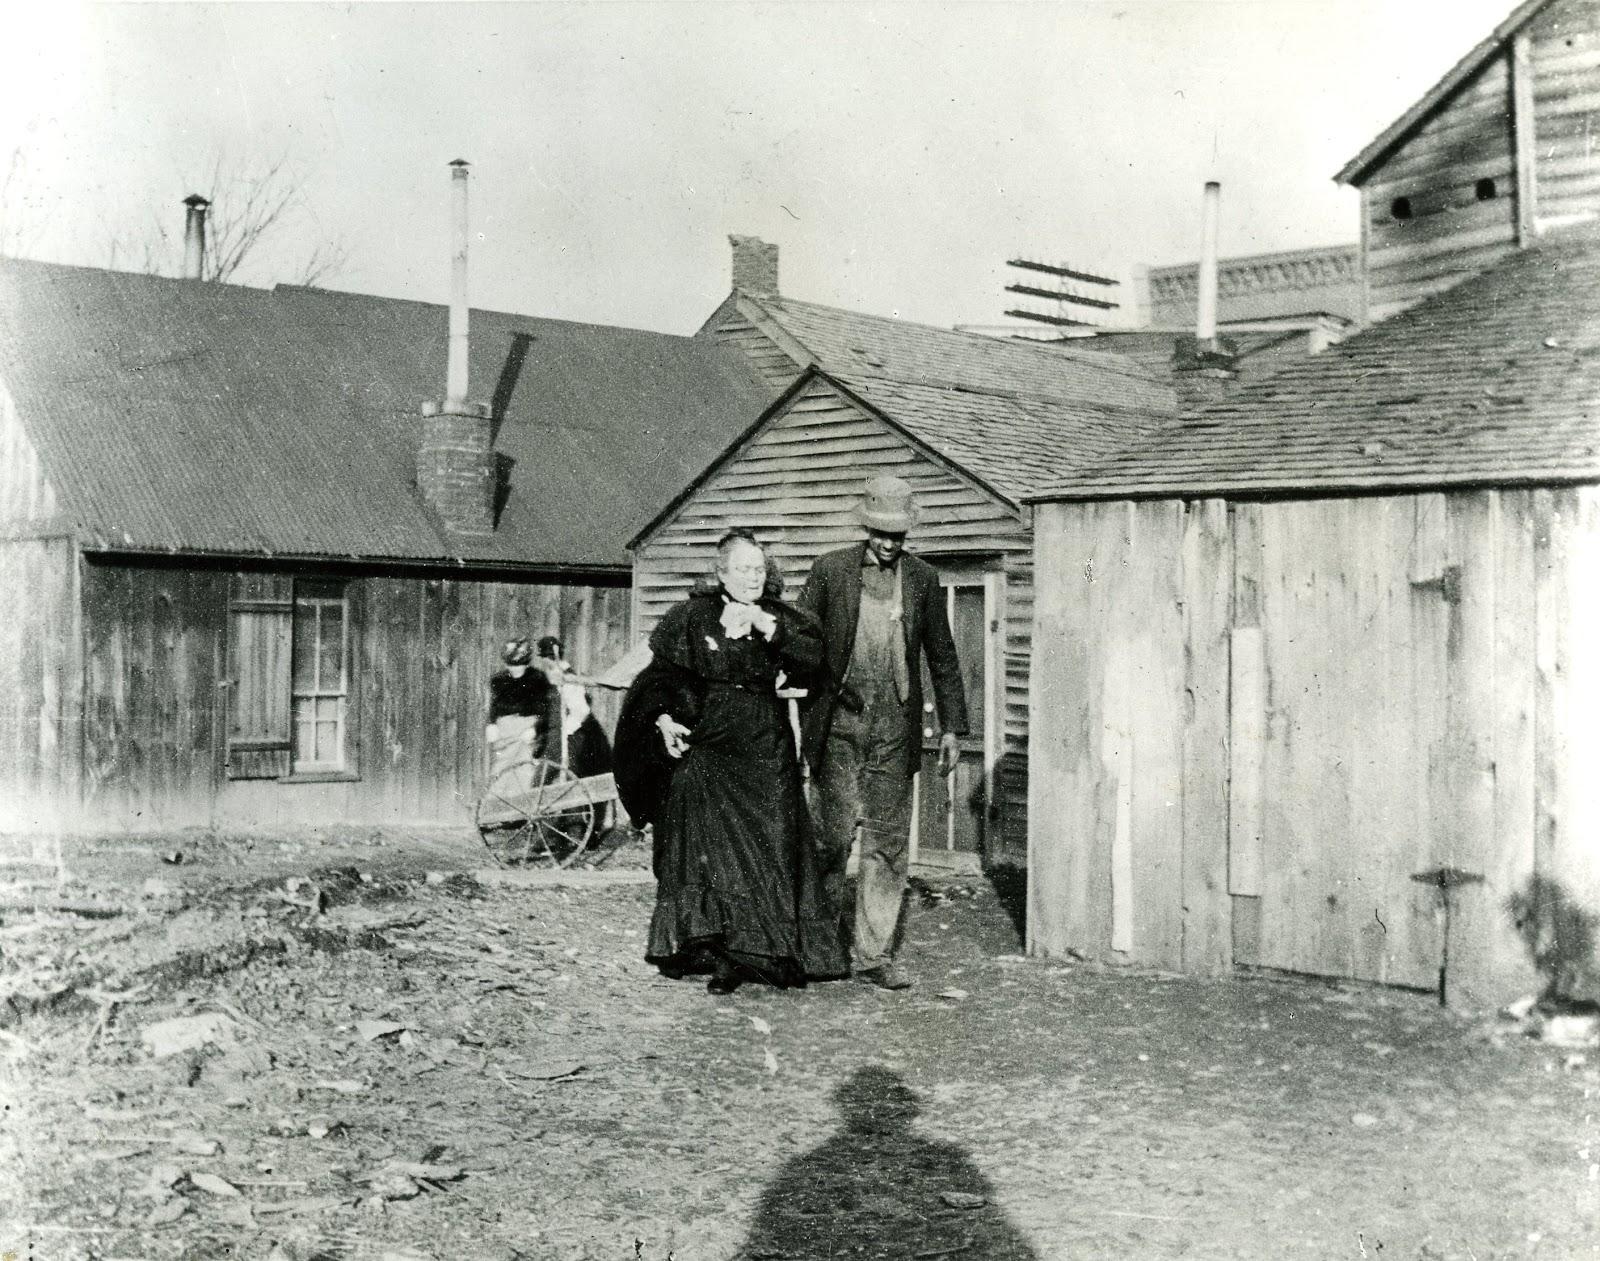 Kansas dickinson county abilene - Marshal Benham Leading Nation Away From Schilling S Saloon Photograph Courtesy Of The Dickinson County Historical Society